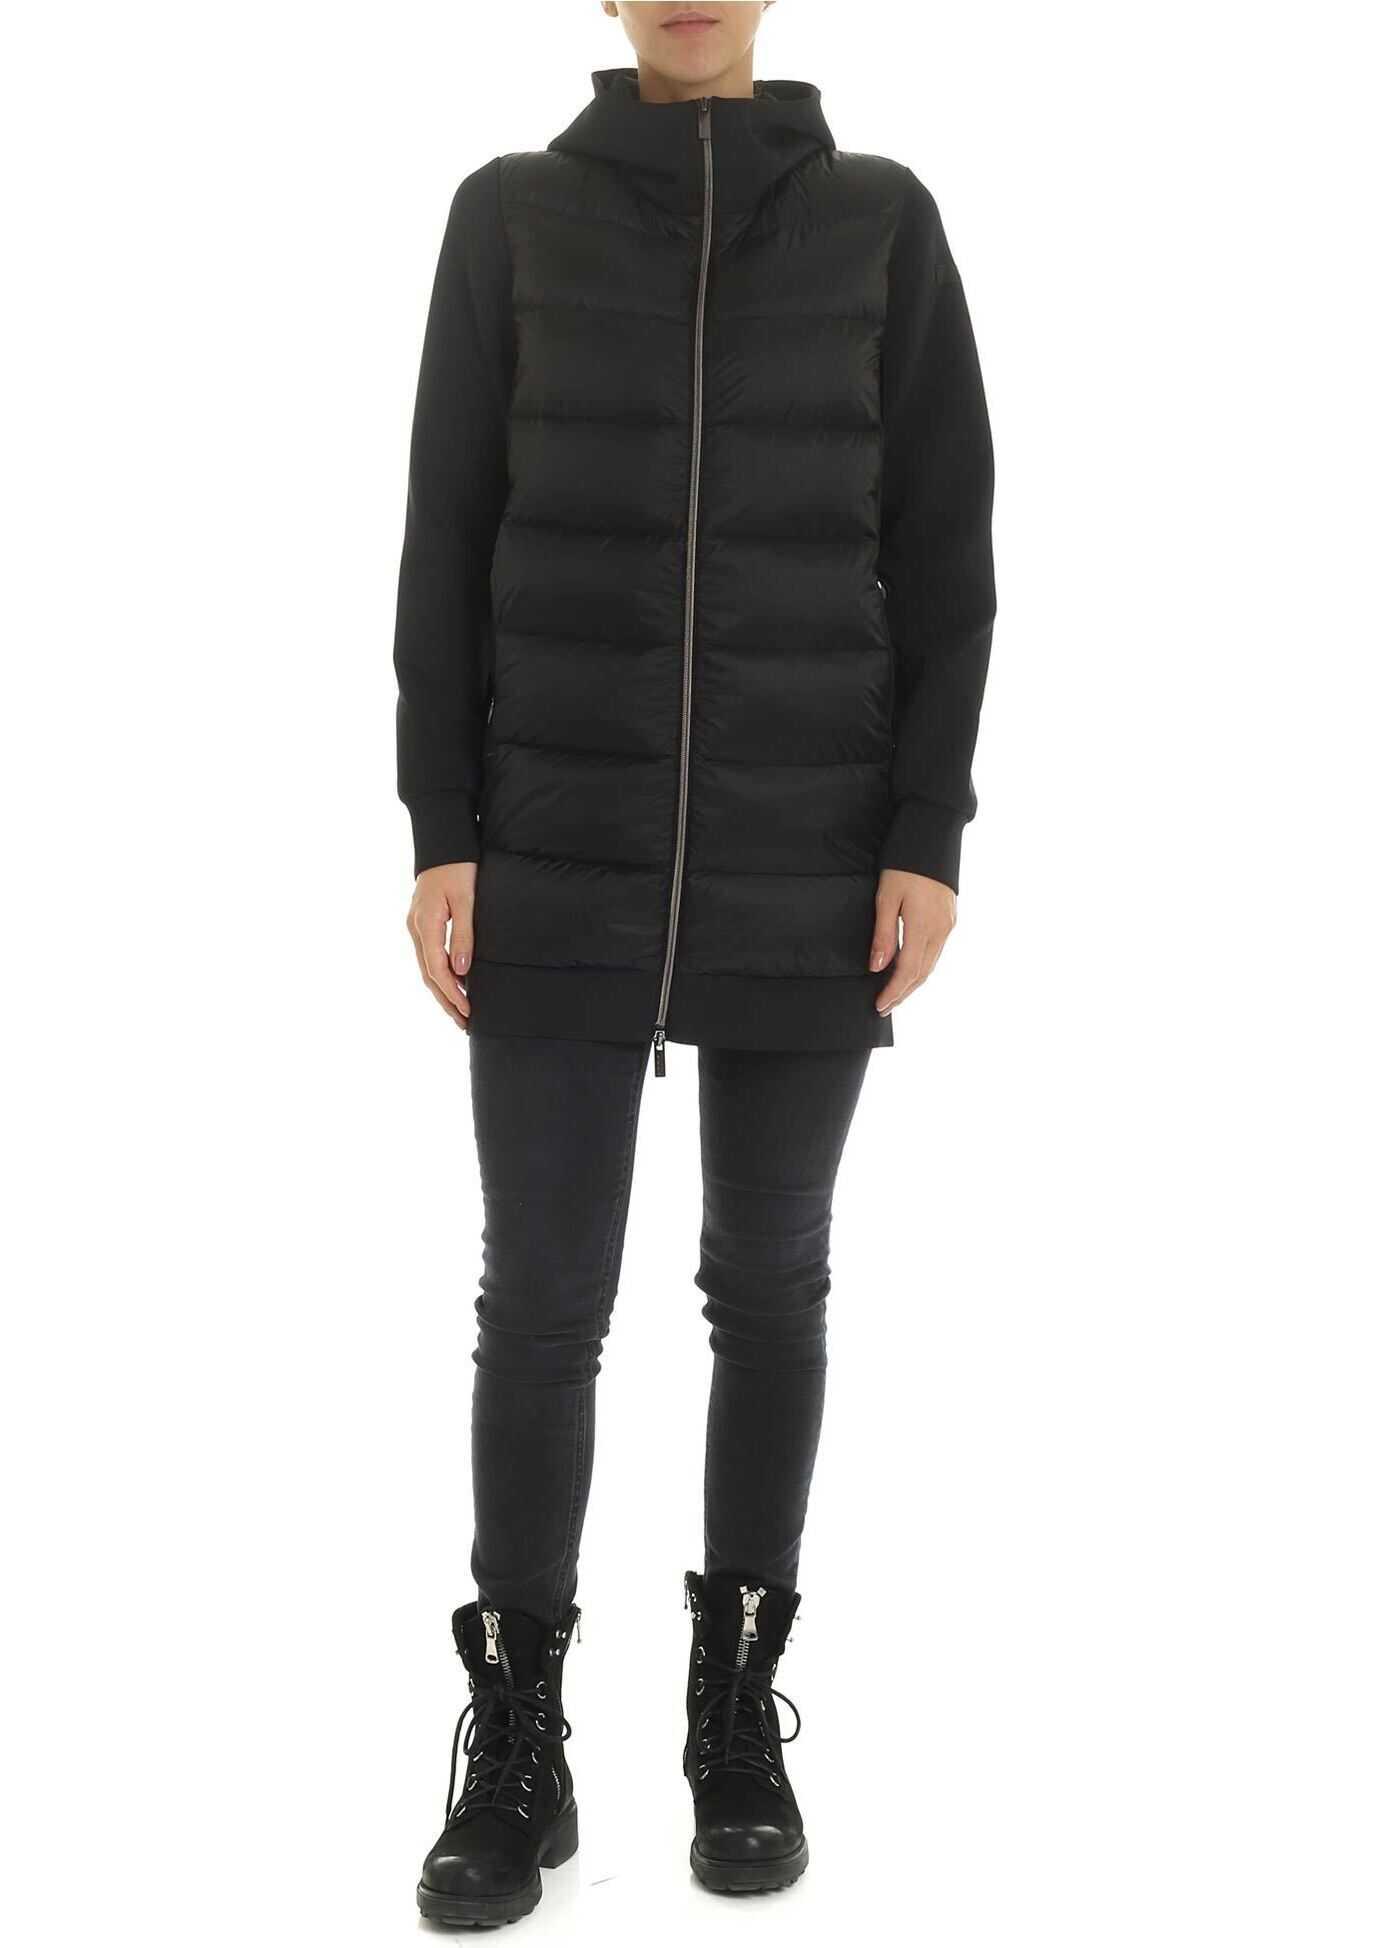 RRD Roberto Ricci Designs Black Hoodie With Padded Insert Black